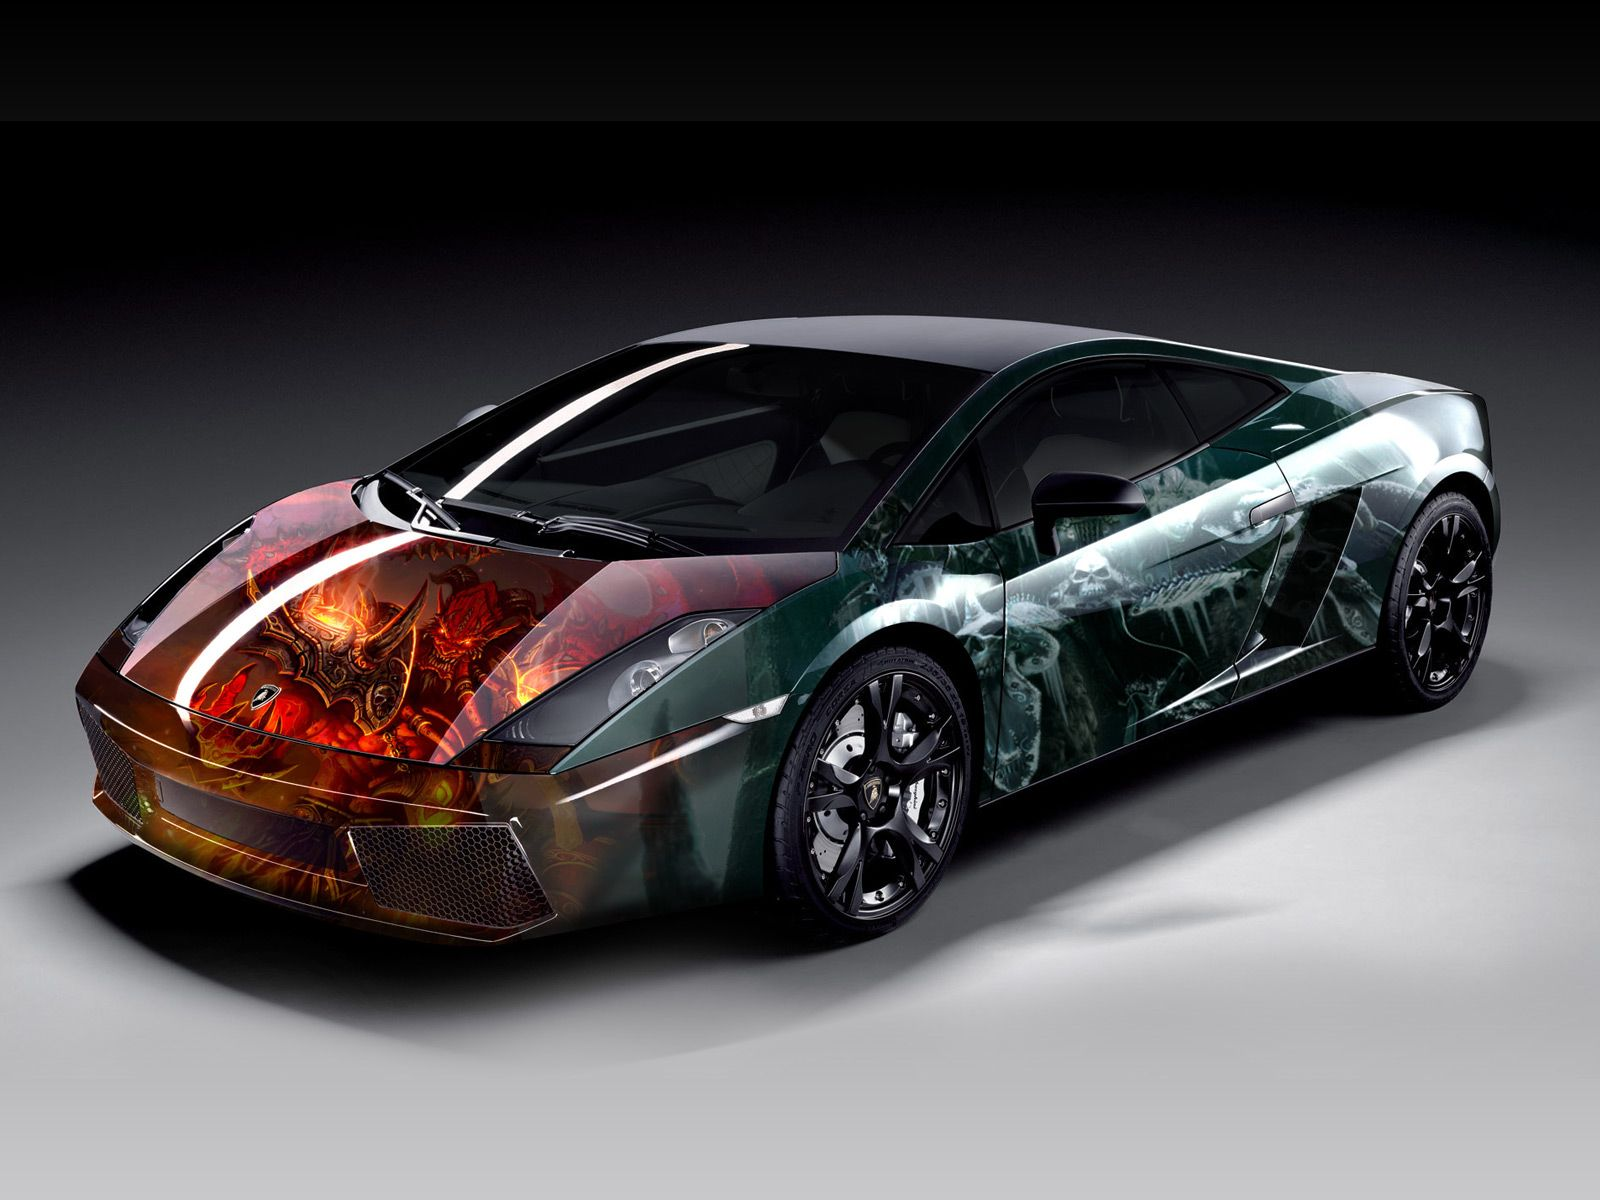 International Fast Cars: Sport Cars